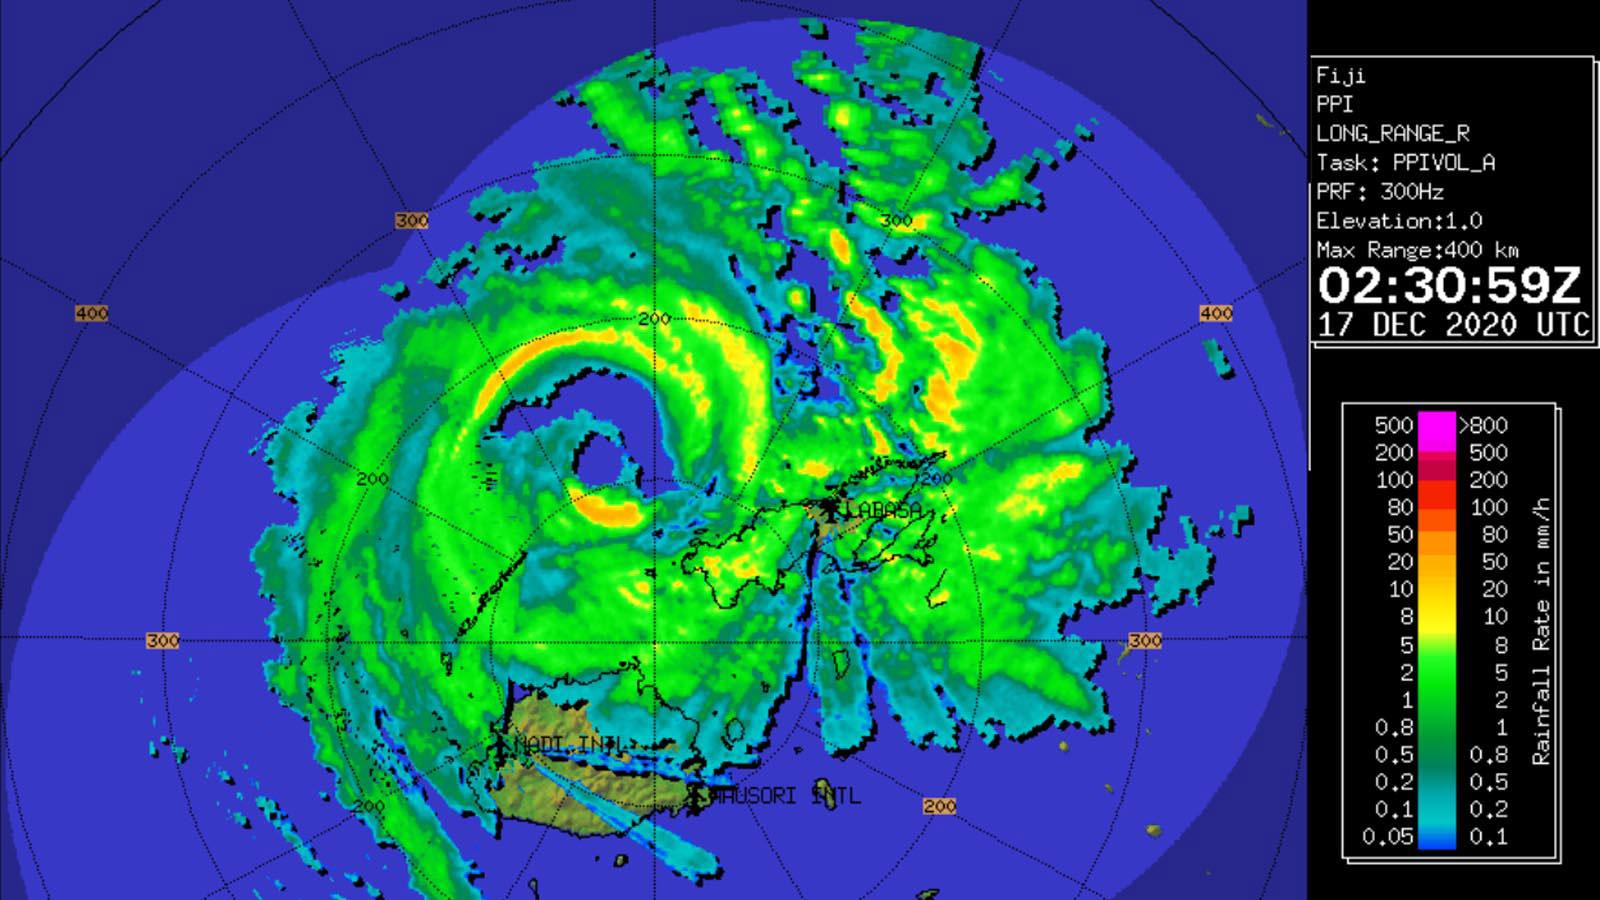 Tropical Cyclone Yasa radar image